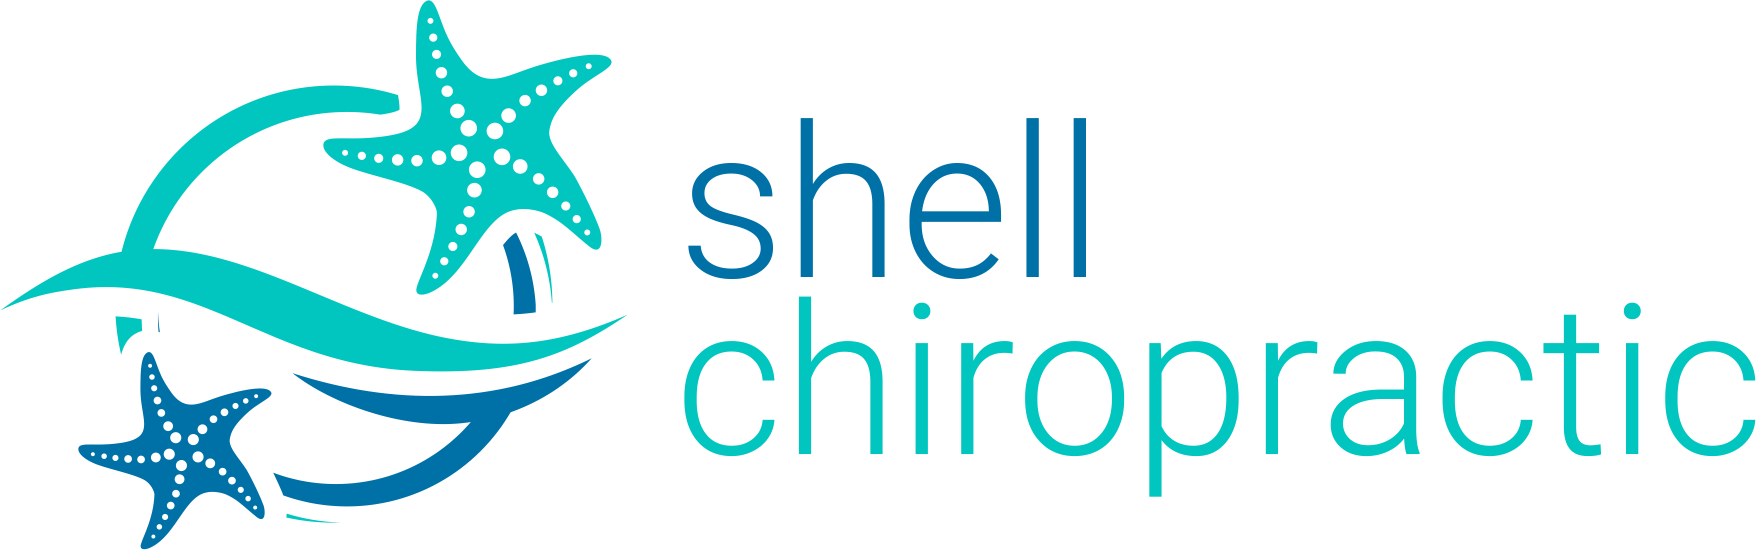 Shell Chiropractic